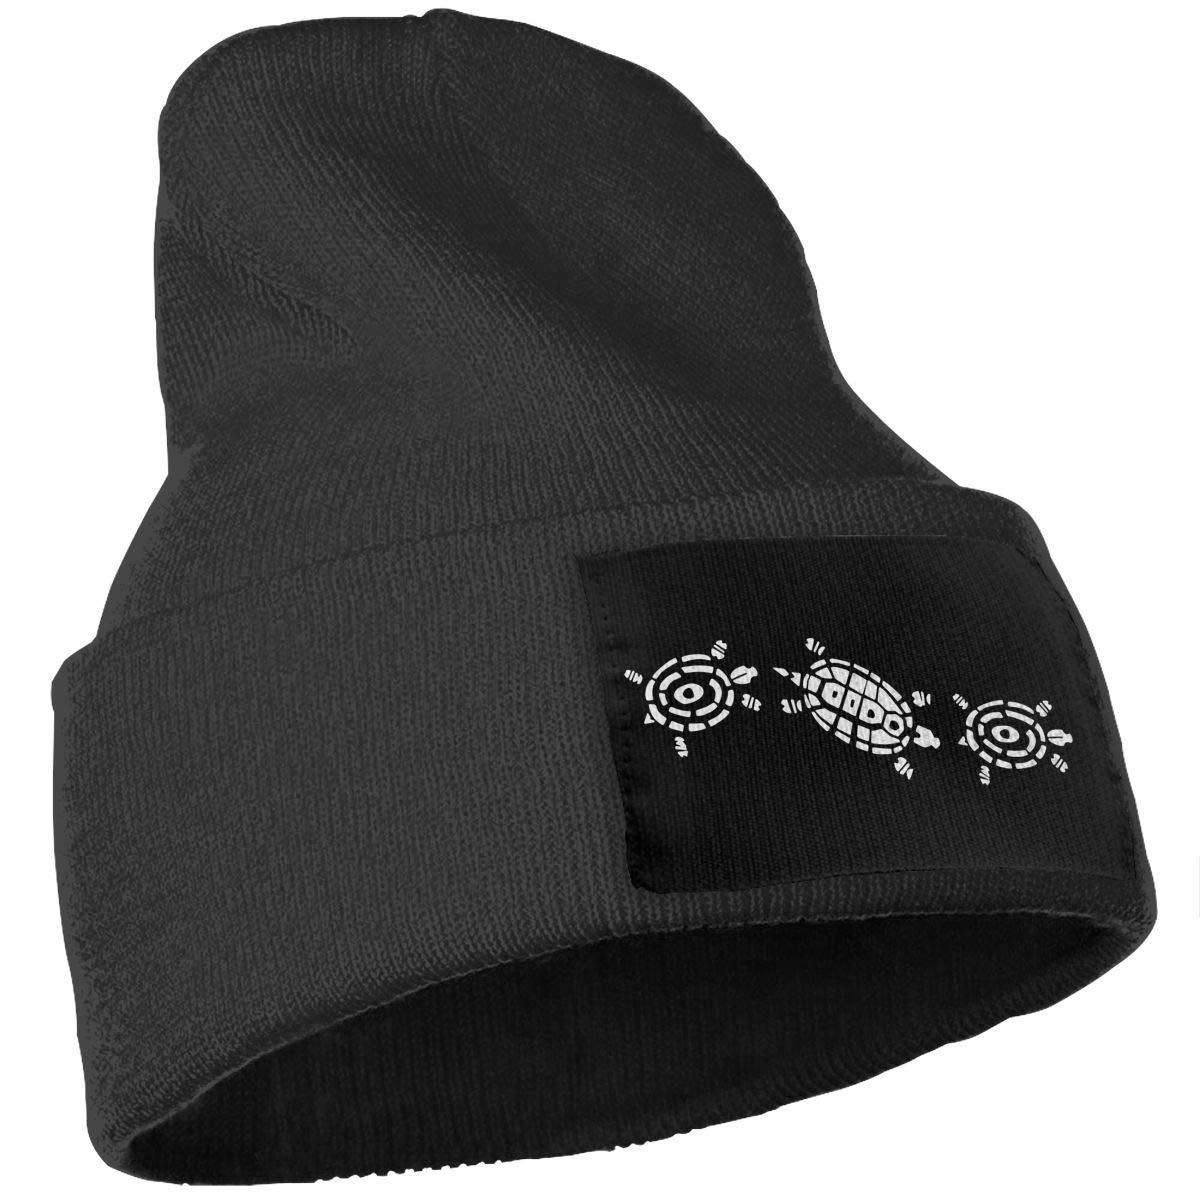 Unisex Turtles Outdoor Warm Knit Beanies Hat Soft Winter Skull Caps